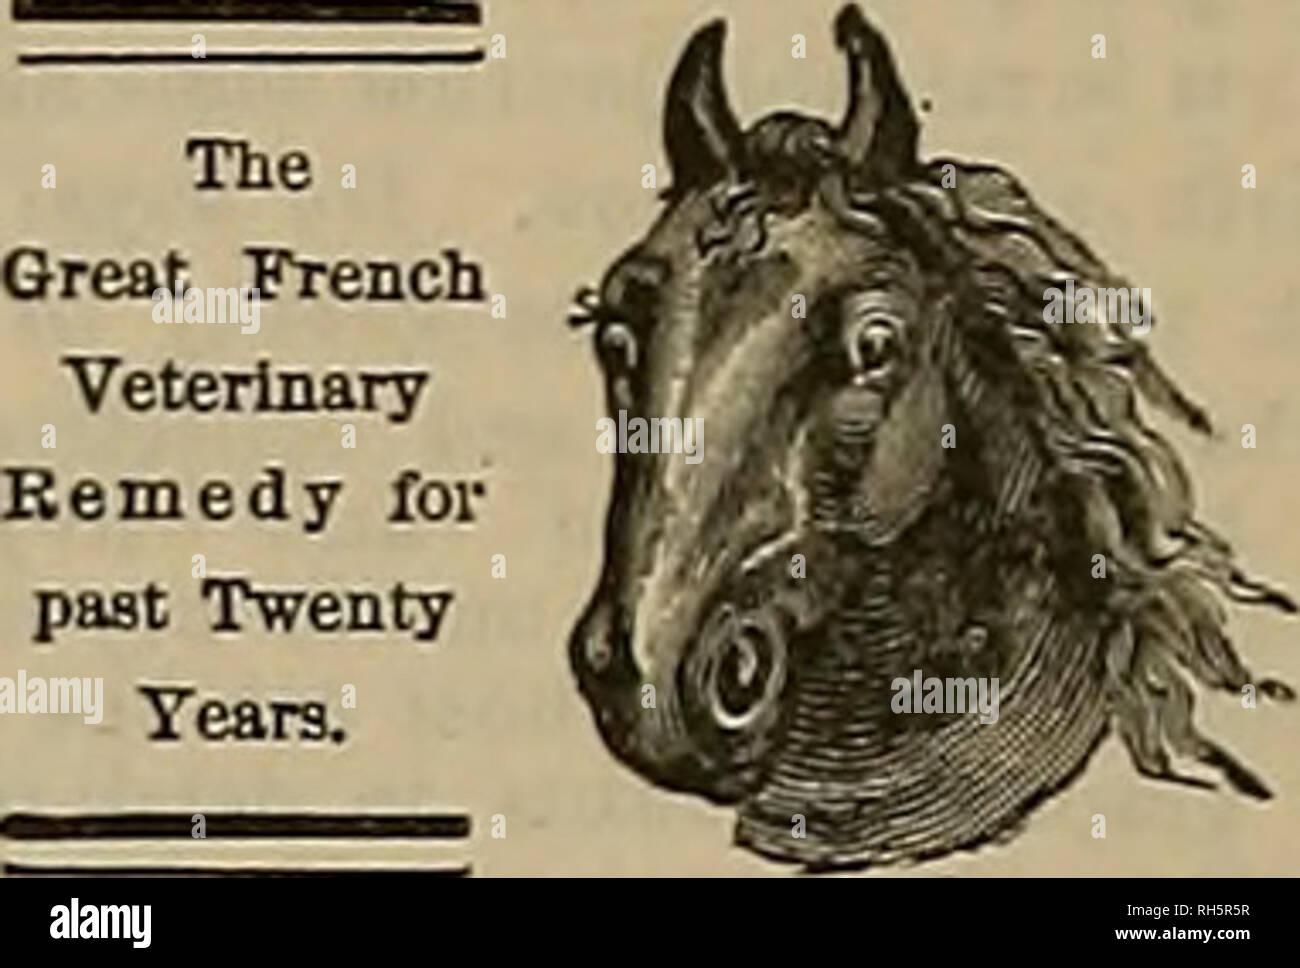 ". Breeder and sportsman. Horses. 316 ^Iie %x£ttLtx atrit jlprjrtsmatt. Nov. 10 AMATEUR CLASS. Length Weight Distance, Deli- Accu- ofRod. of Rod. Feet. cacy. racy. Total. Ft. In, Oz. Thomas W. Olcott 11 5 9$ 70 16 16 10l| ""W- D. Frothingham 11 5 94 70J 9 19 96* W.G.Paddock 116 9i 68 10 20 9« Howard Paddeck 116 9J 78 6 15 98 DaytonBall 116 9 65 8 18 91 B. F.Keeae 10 8 8 67 8 8 8* Stuart G. Spier 110 7 69 B 18 82 Dp. H. L. ""Whitheck 11 6 6£ fio 6 8 78 H. M. Olcott 116 9.i 6a 2 9 74 Moses Stark 10 5 7 56 0 i 60 AMATEUE SECOND 0L4SS. Chas. L.Gove. 10 8 8 C2 6 6 76 H. A.Goffe 10 7 9 57  - Stock Image"